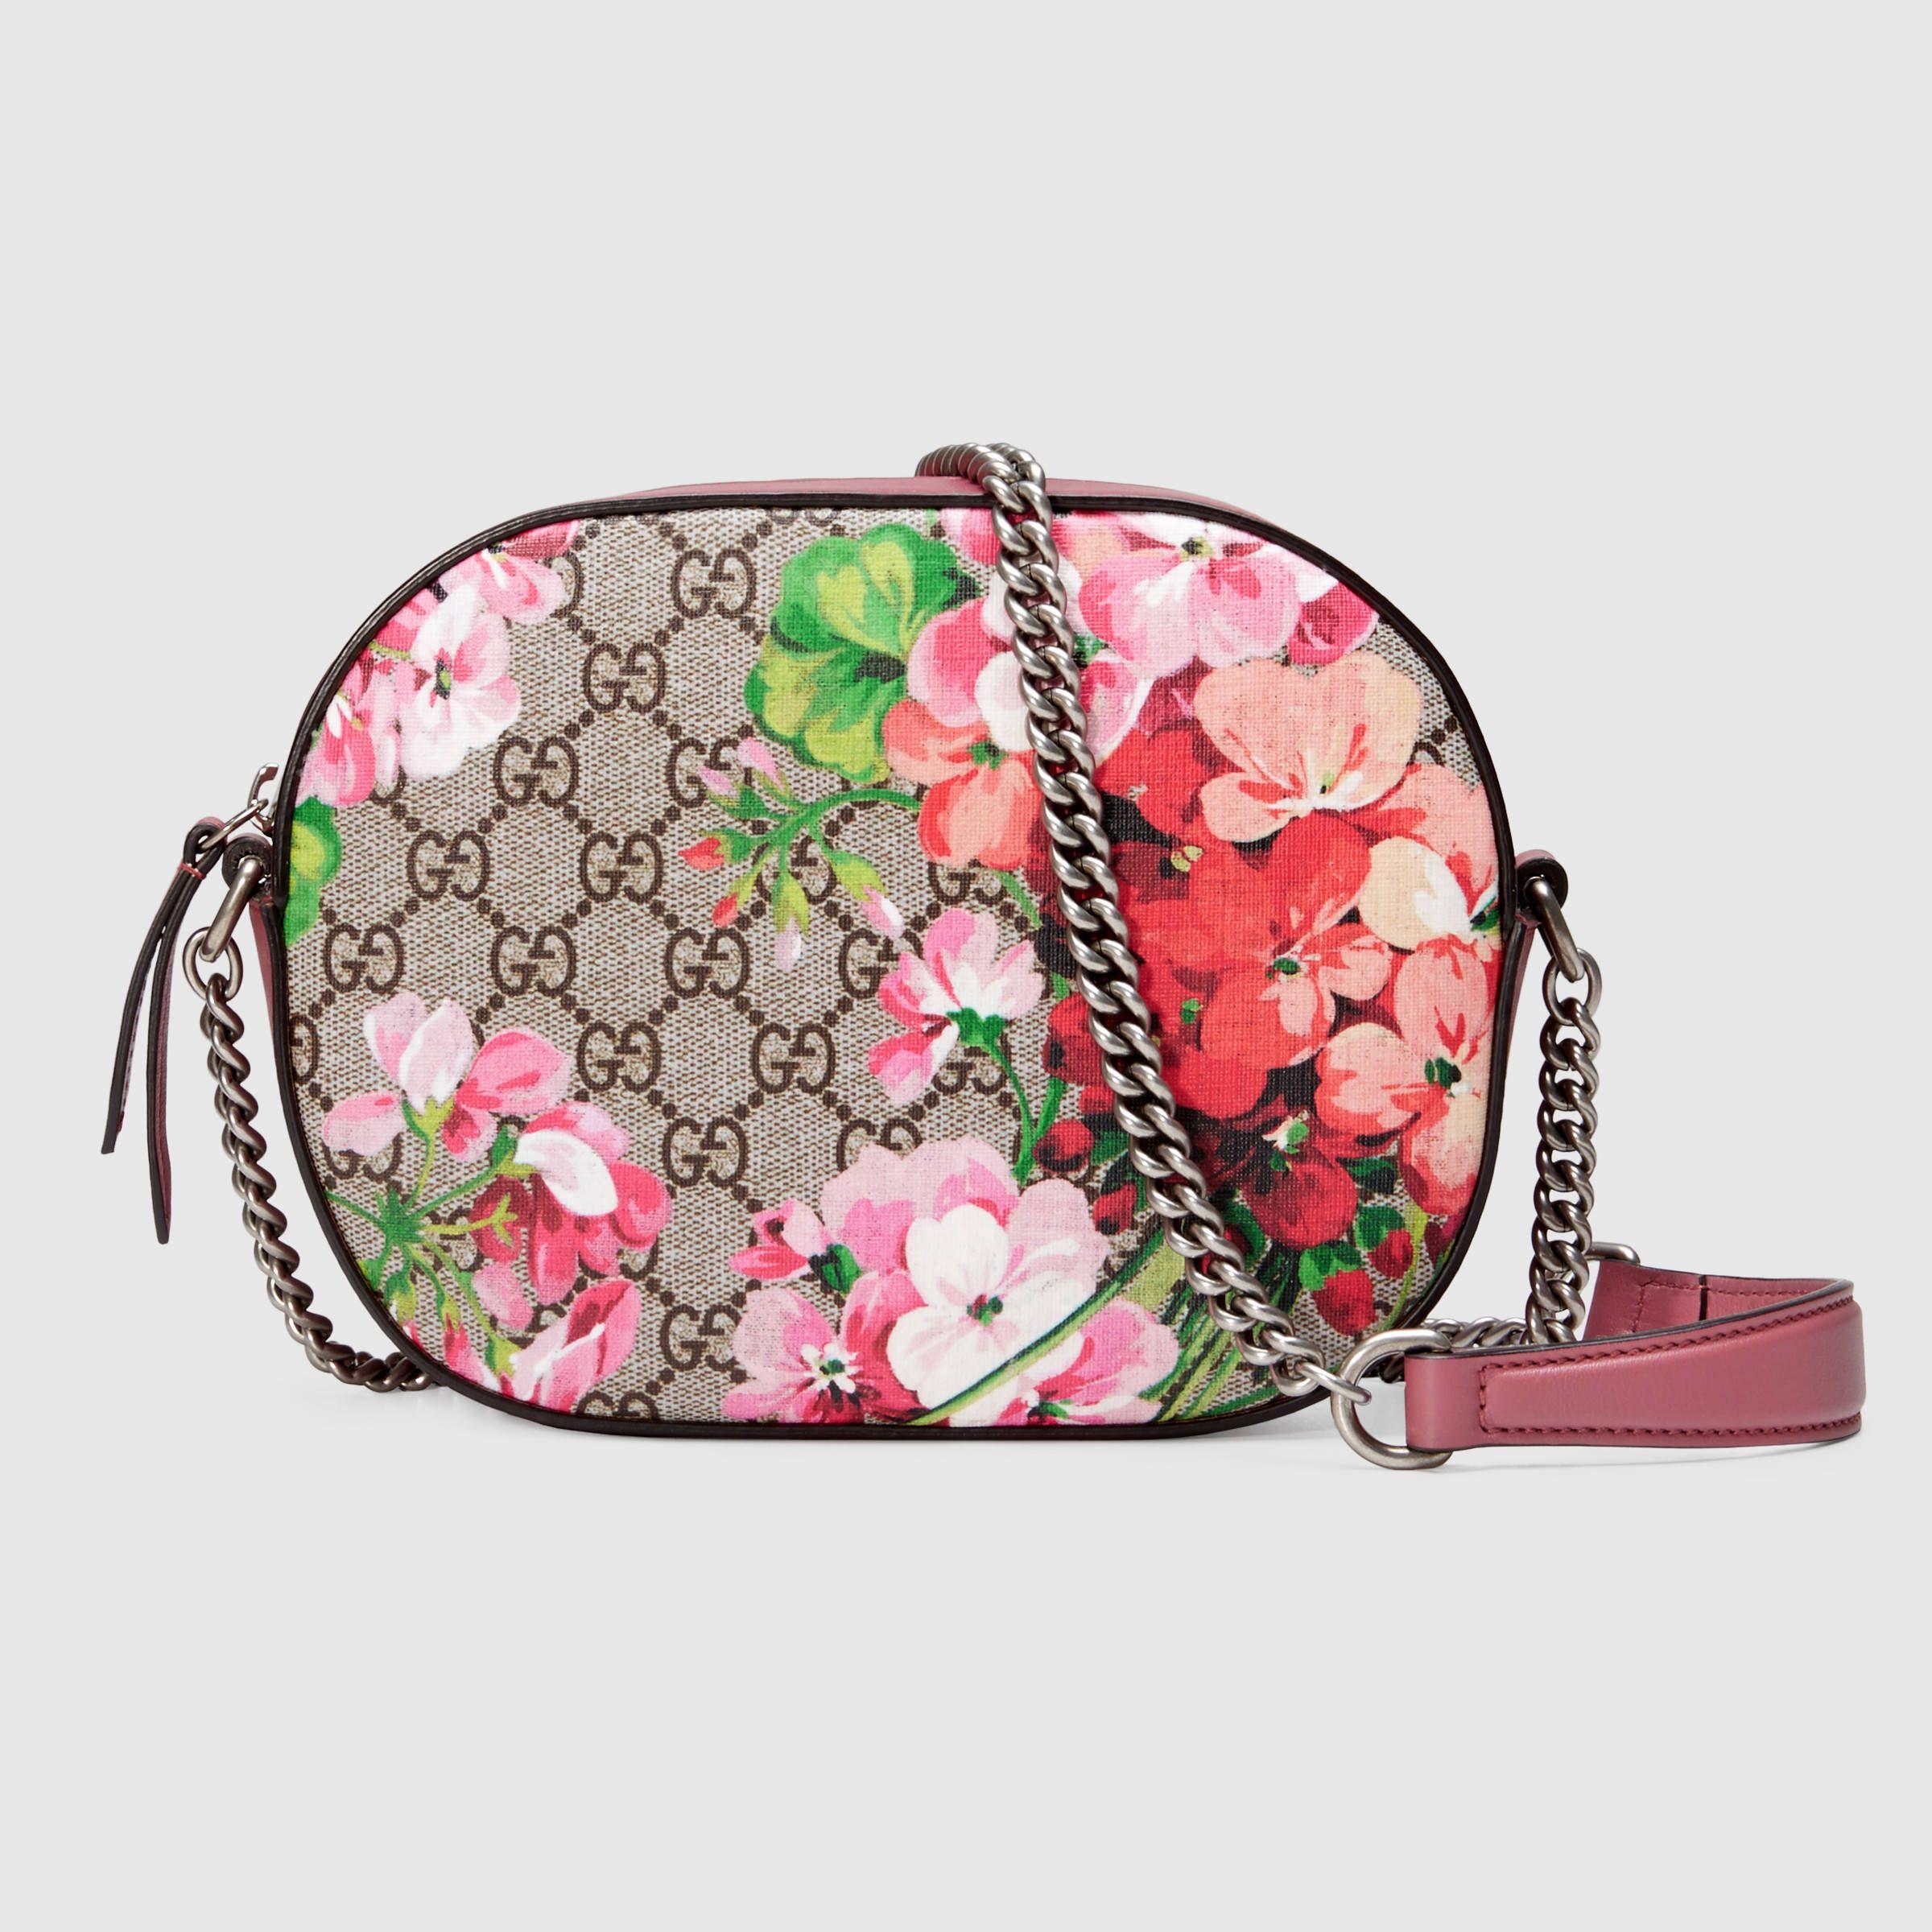 30dd2e36b52 Gucci Women - Blooms GG Supreme mini chain bag - 409535KU2IN8693 ...